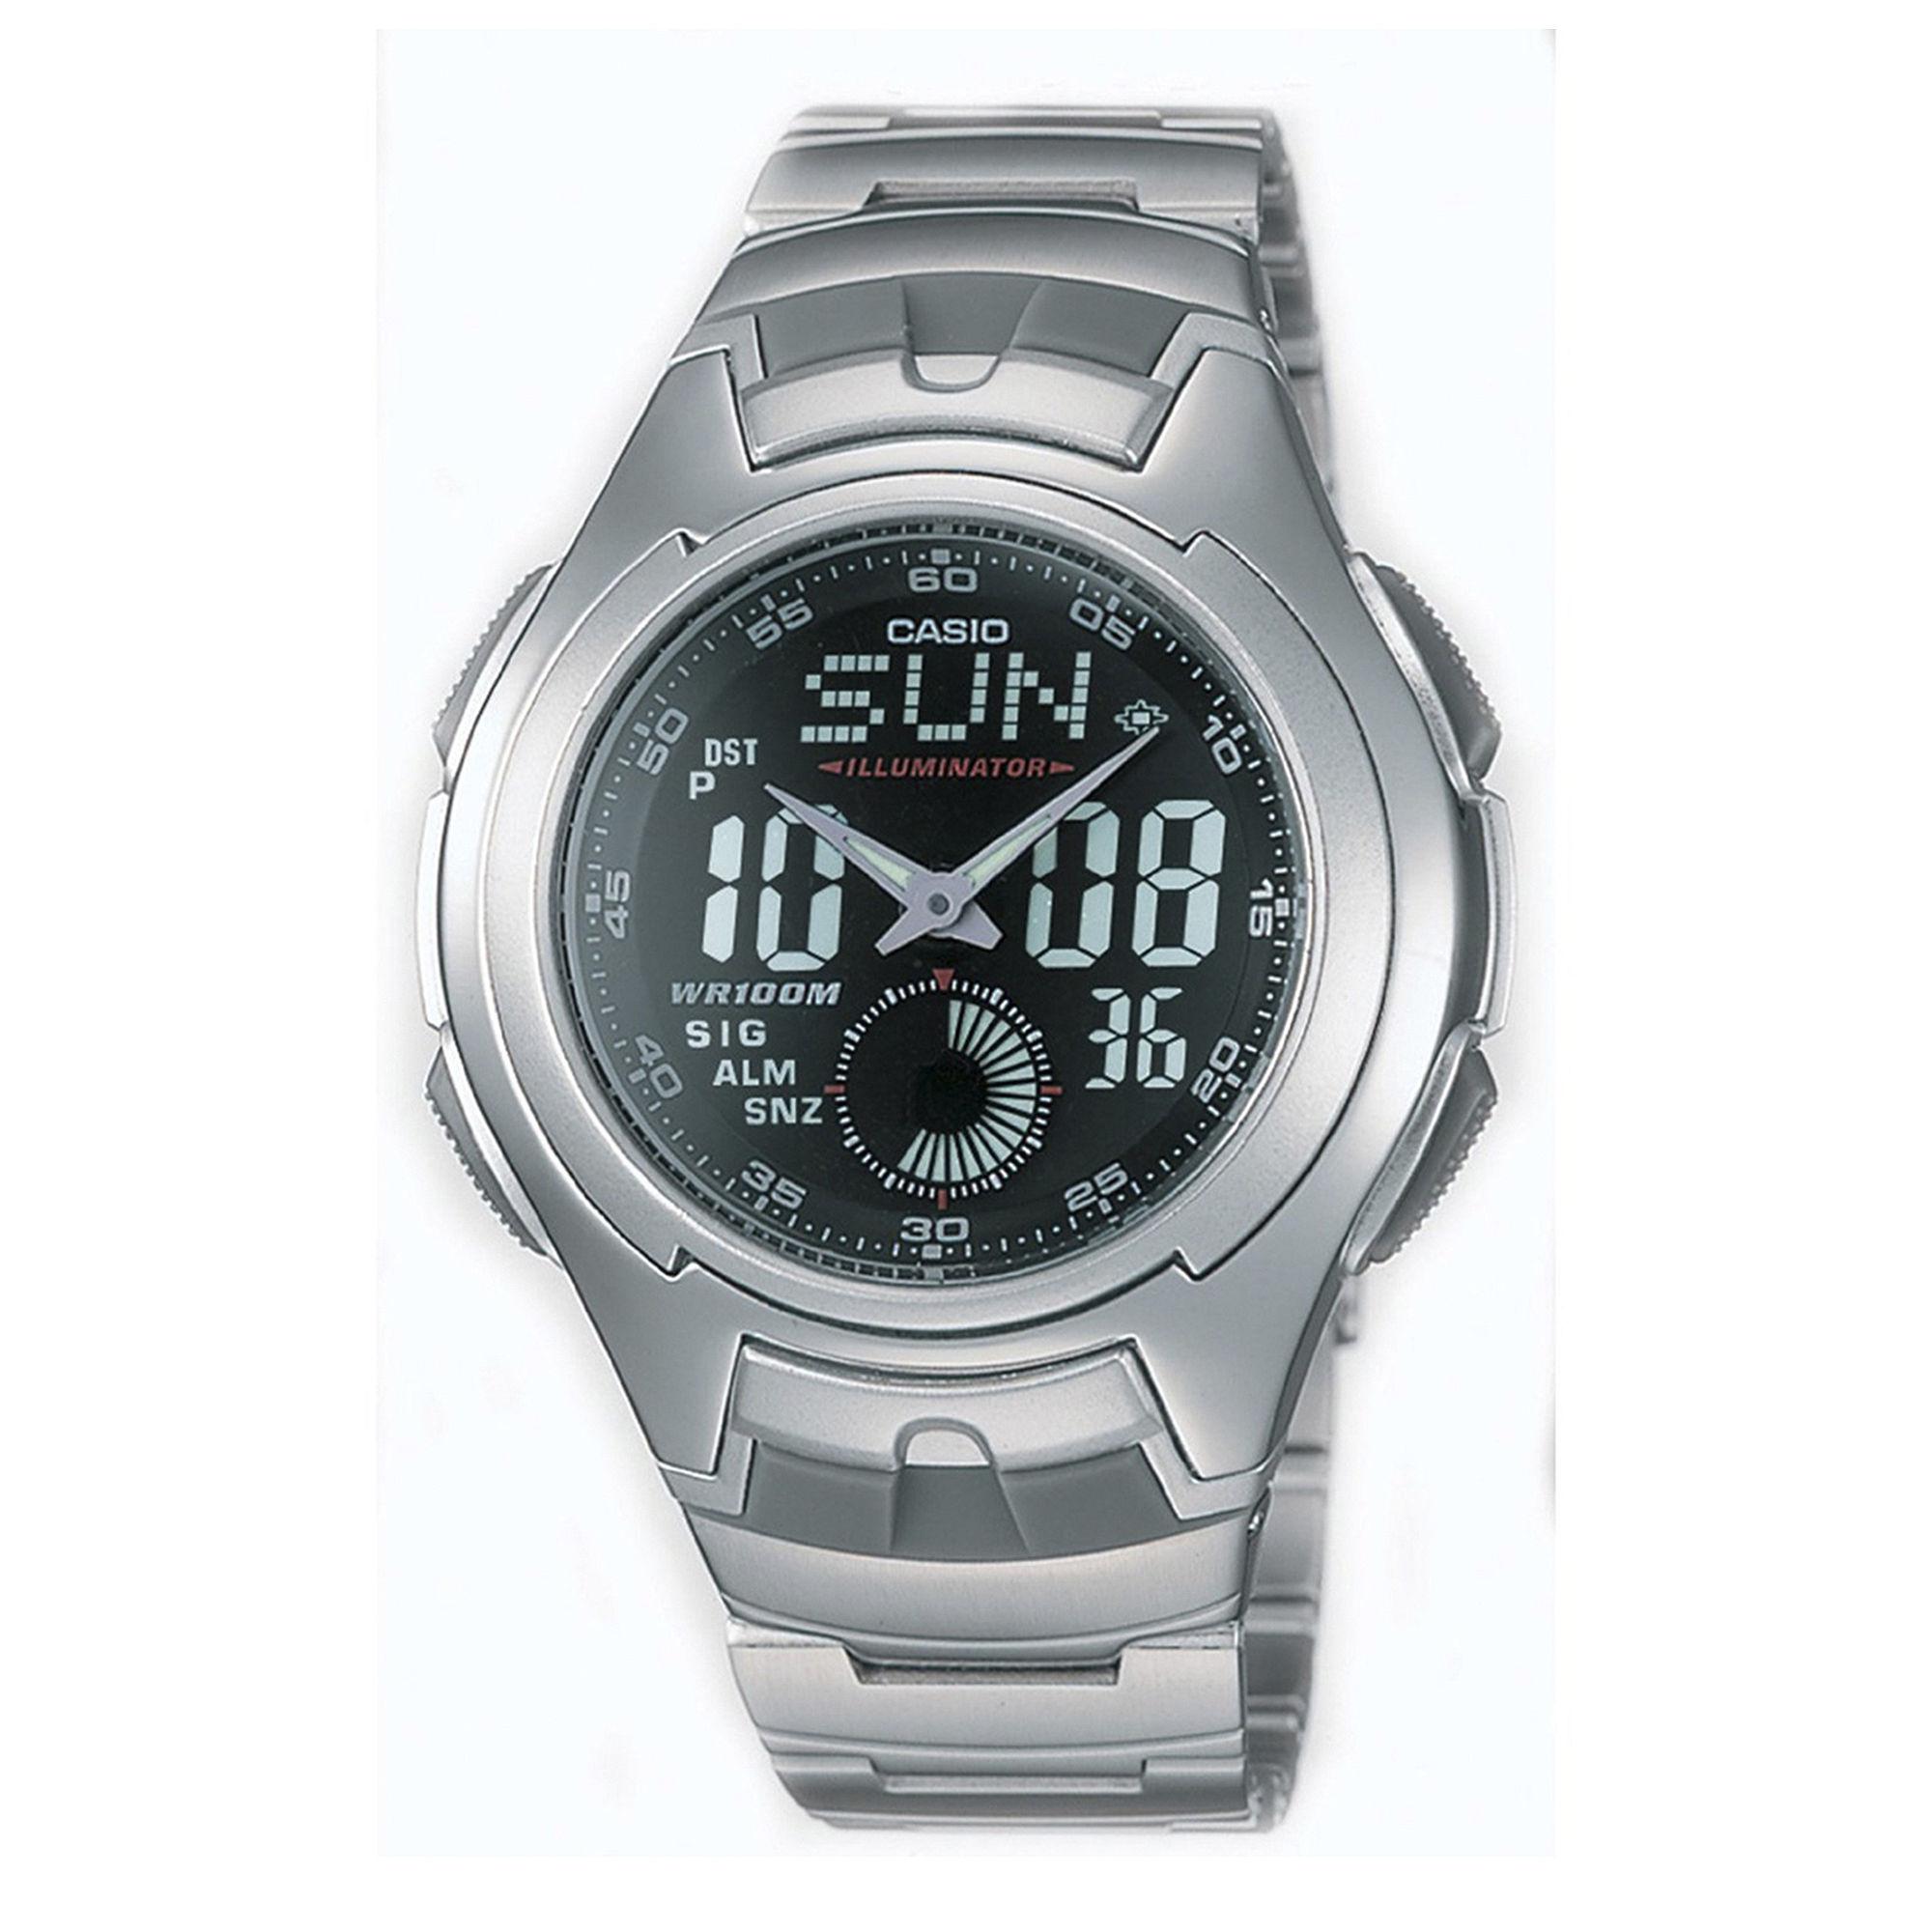 Casio Mens Stainless Steel Analog/Digital Watch AQ160WD-1BV